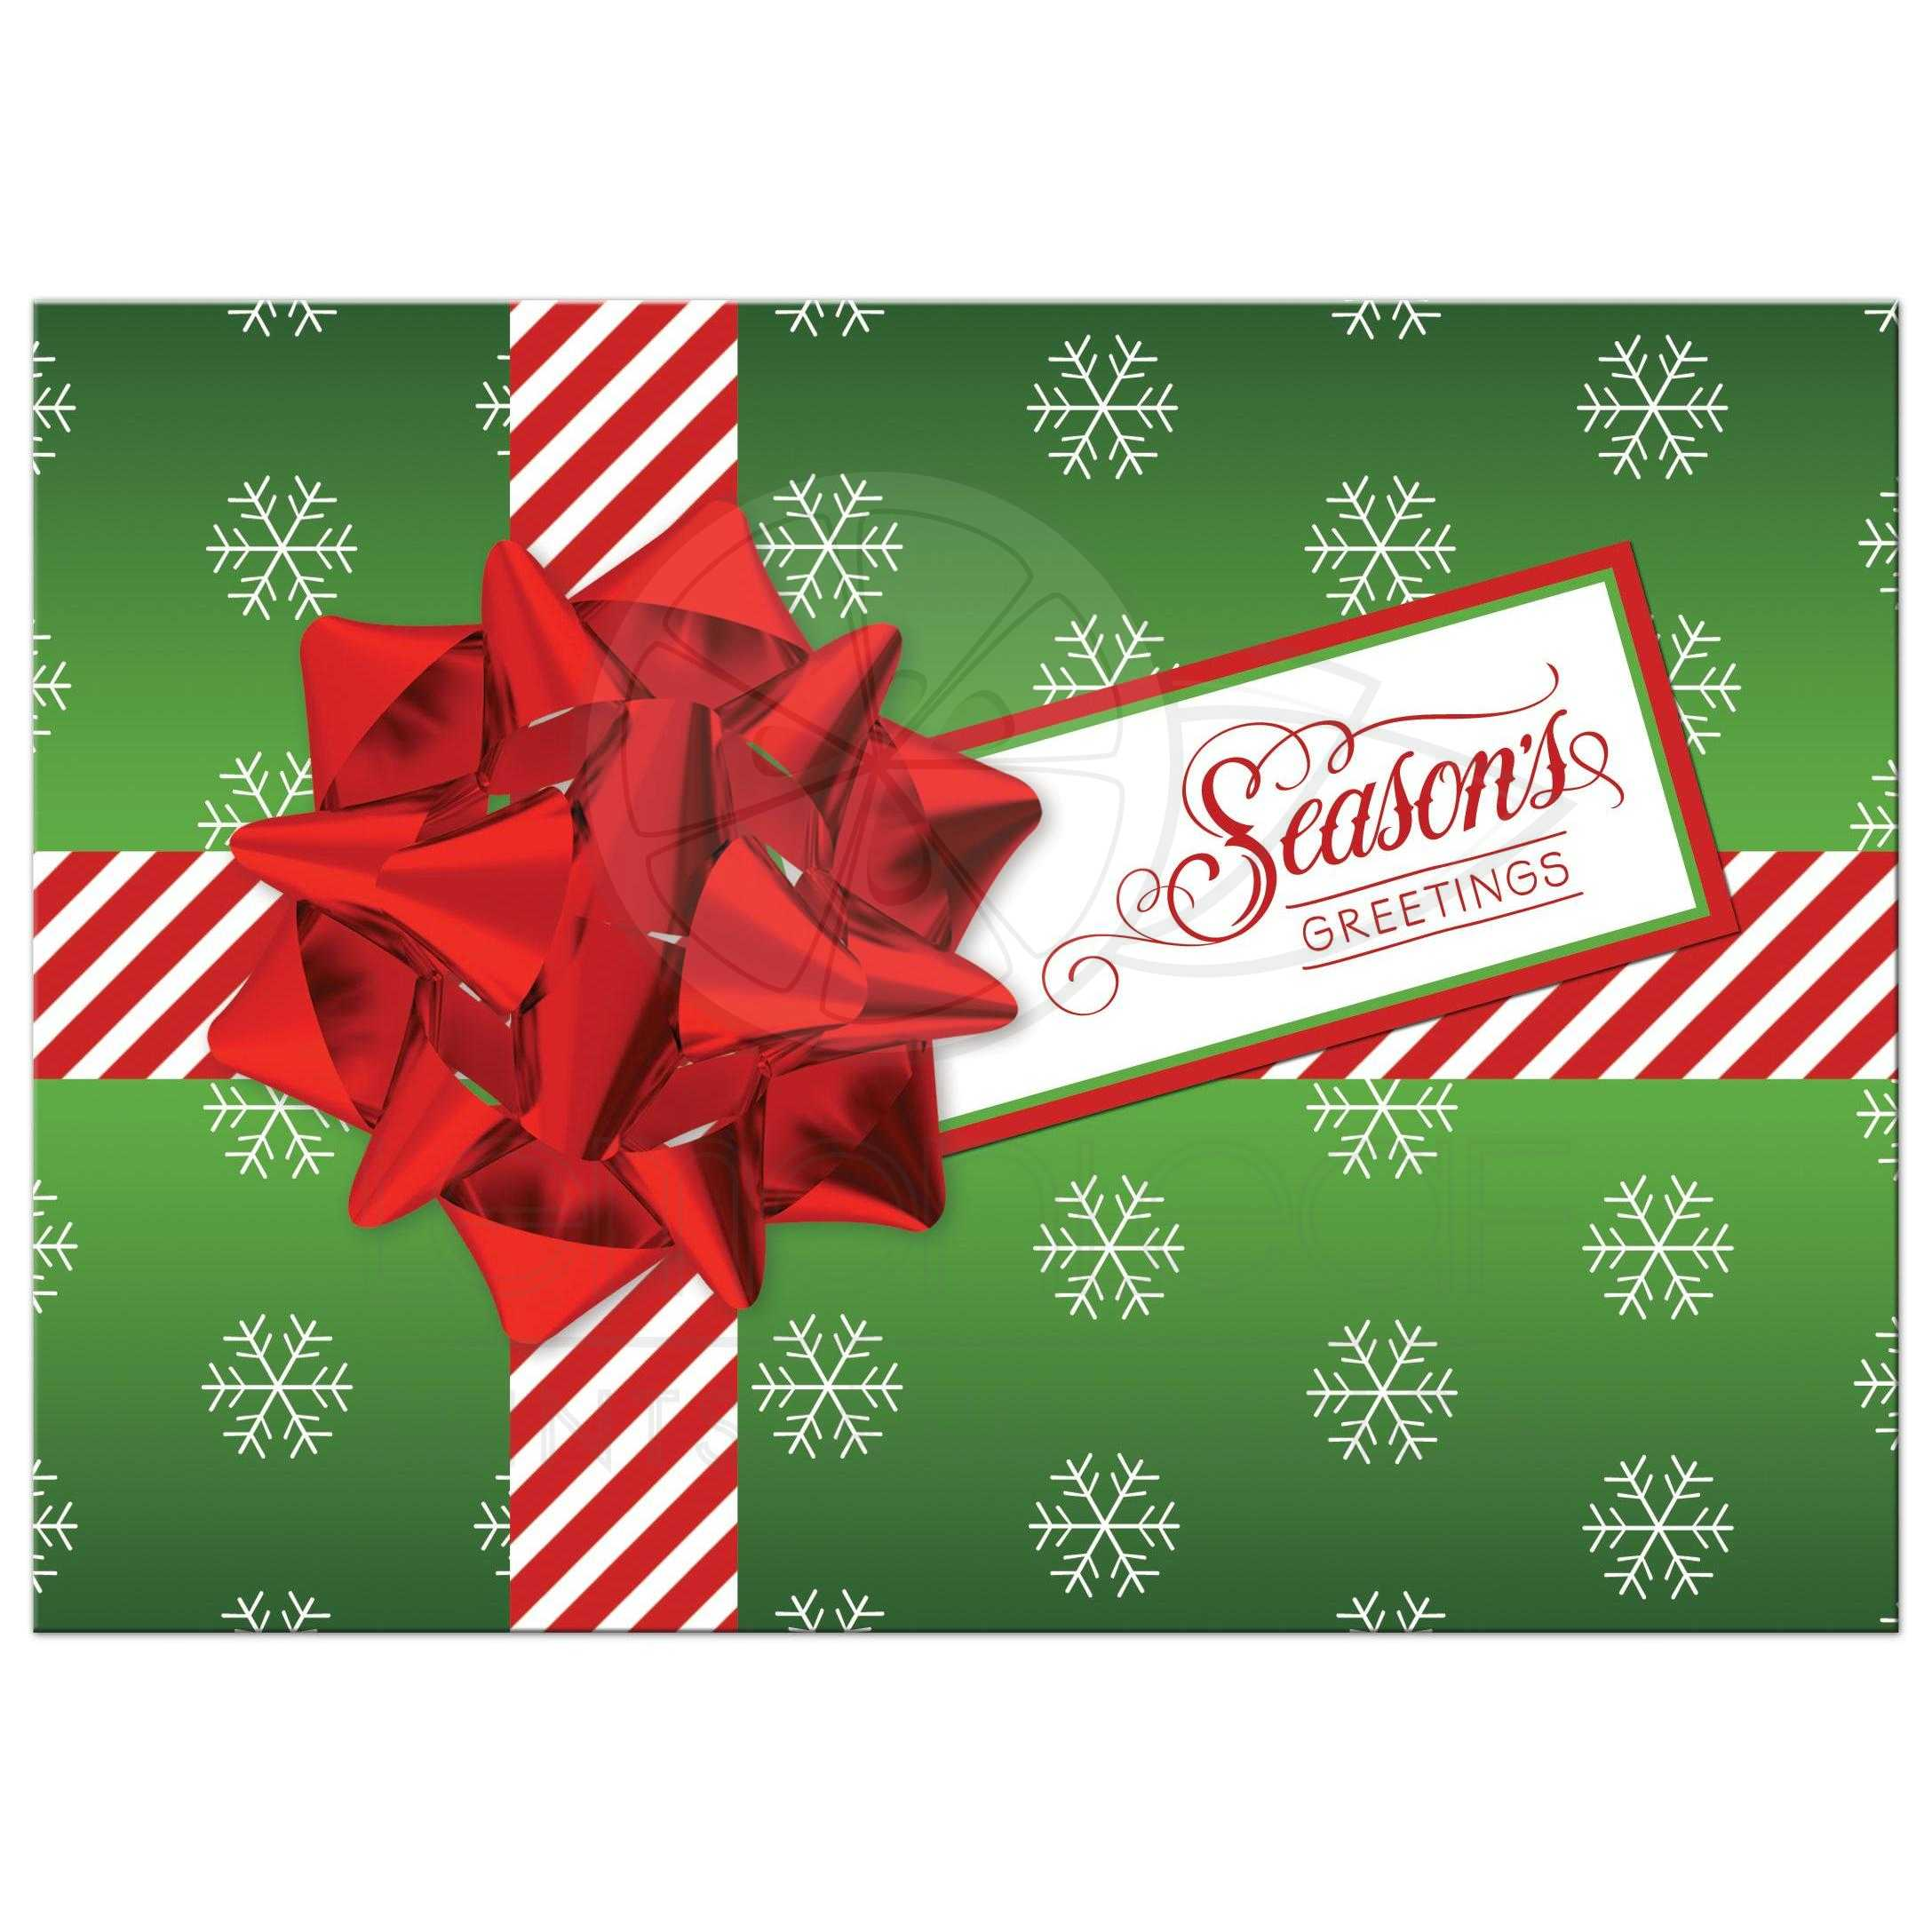 5x7 Flat Season's Greetings Photo Card | Green, White, Red ...